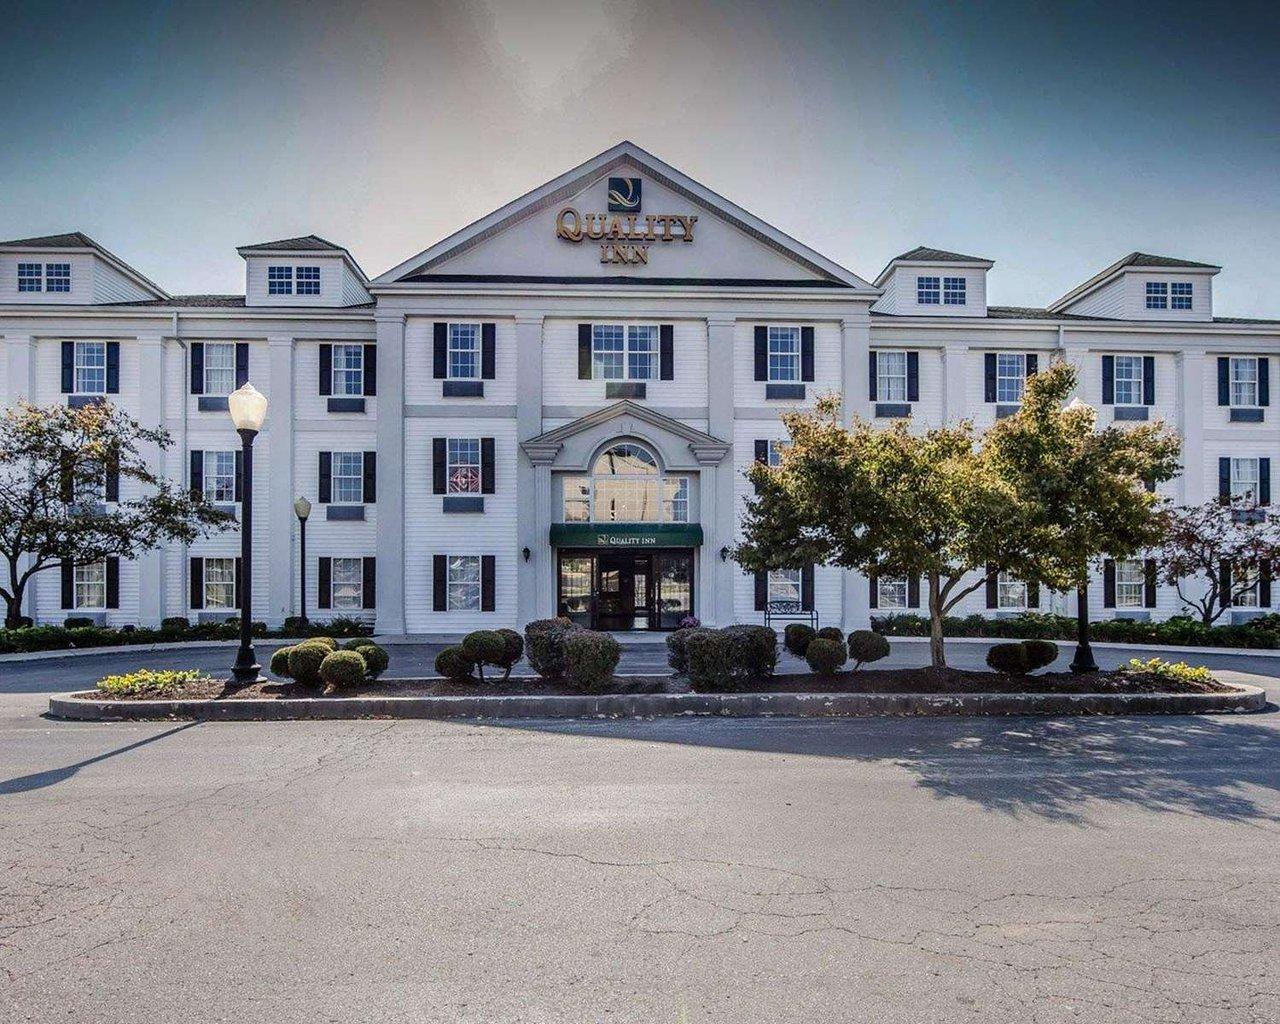 Quality Inn 67 7 5 Updated 2018 Prices Hotel Reviews Richmond Ky Tripadvisor